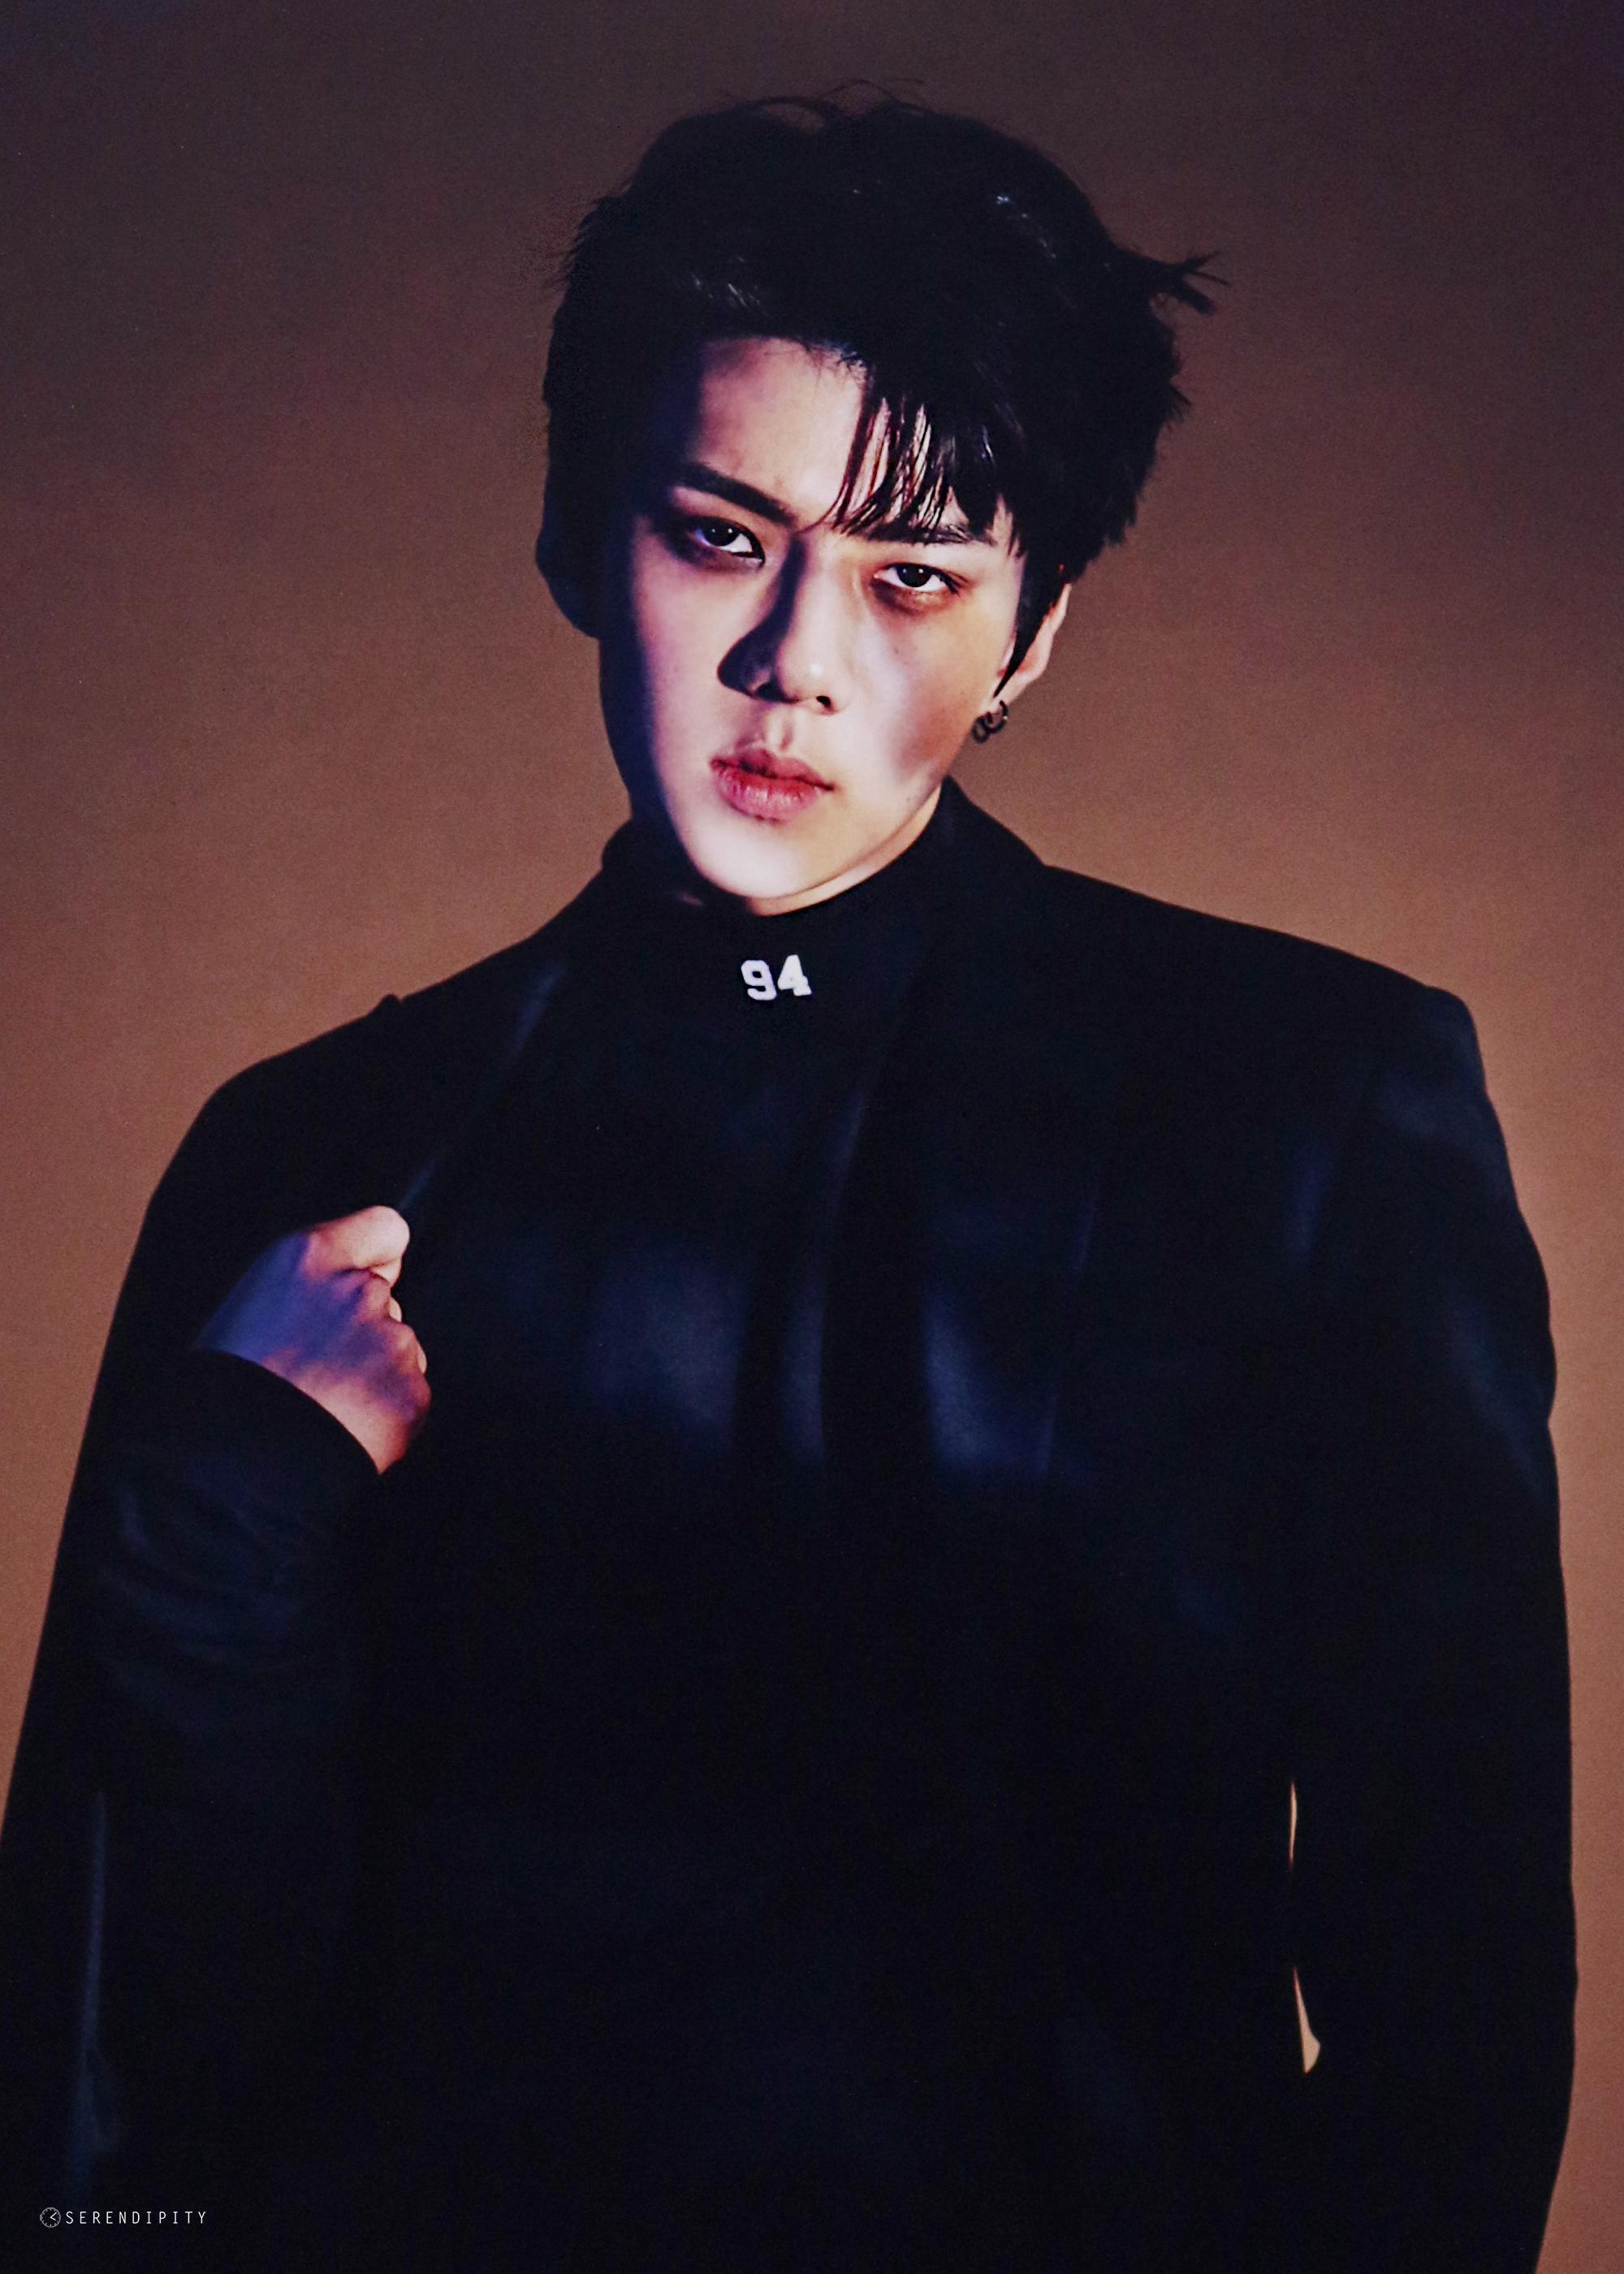 Official Sehun Thread ∣ 오세훈 ⧼ ⋮ ♛ Exo S Maknae ♛ Ex Act